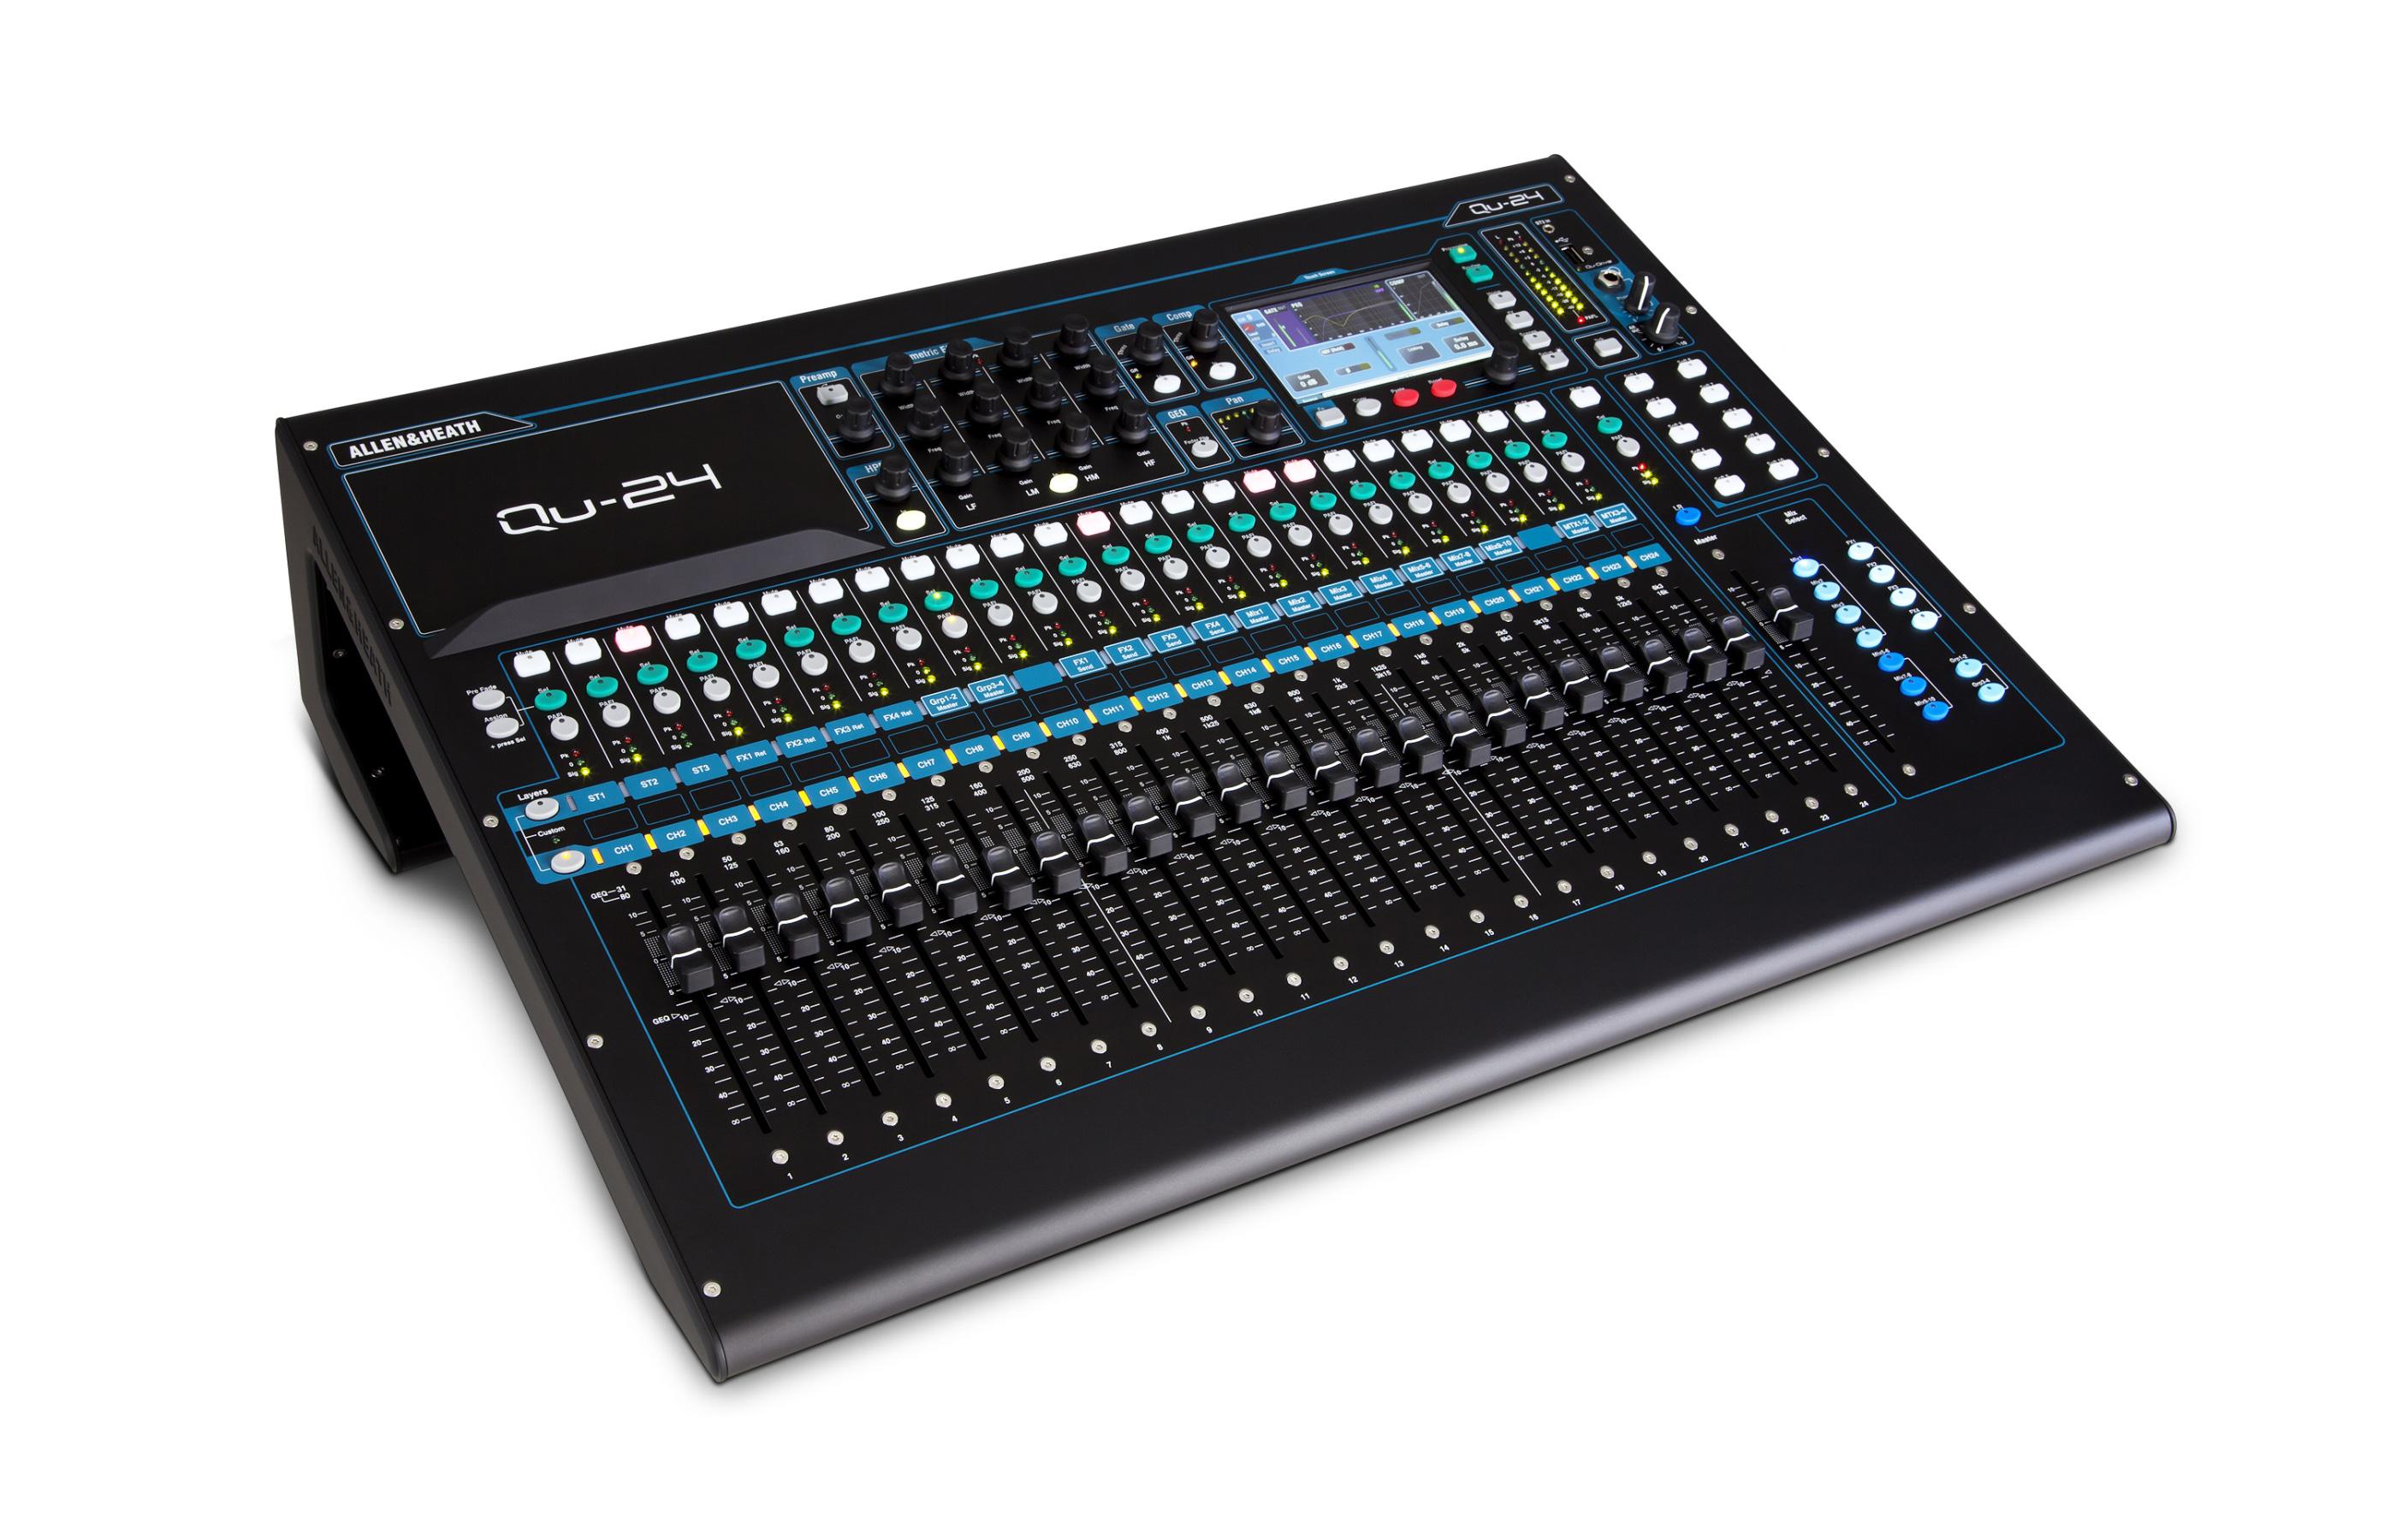 allen heath qu 24 30 in 24 out digital audio mixer. Black Bedroom Furniture Sets. Home Design Ideas